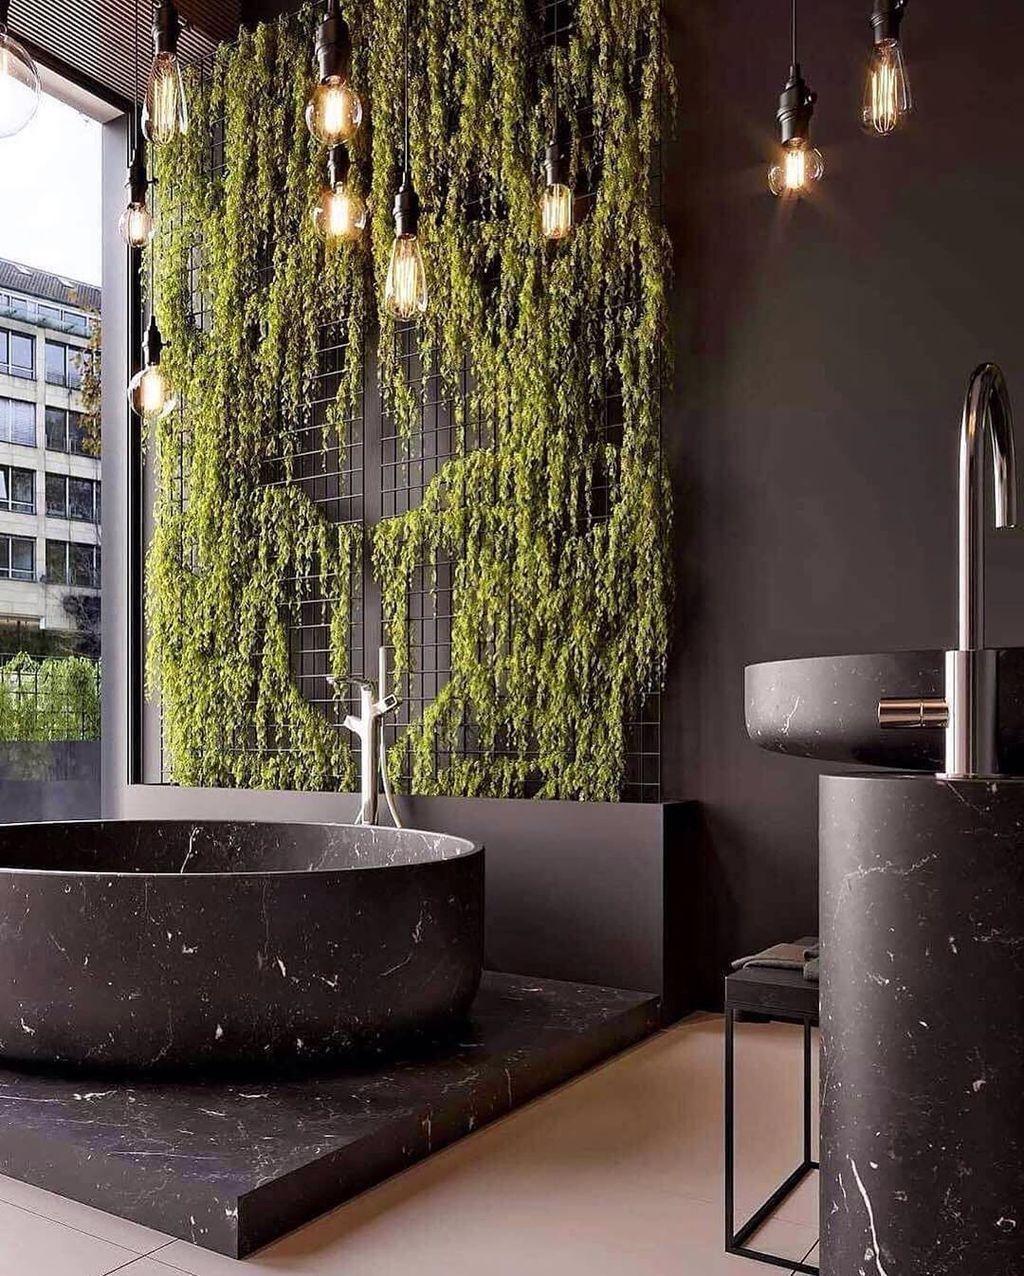 30 Inspiring Black Marble Bathroom Design Ideas With Stylish Accent Marble Bathtub Black Marble Bathroom Marble Bathroom Designs